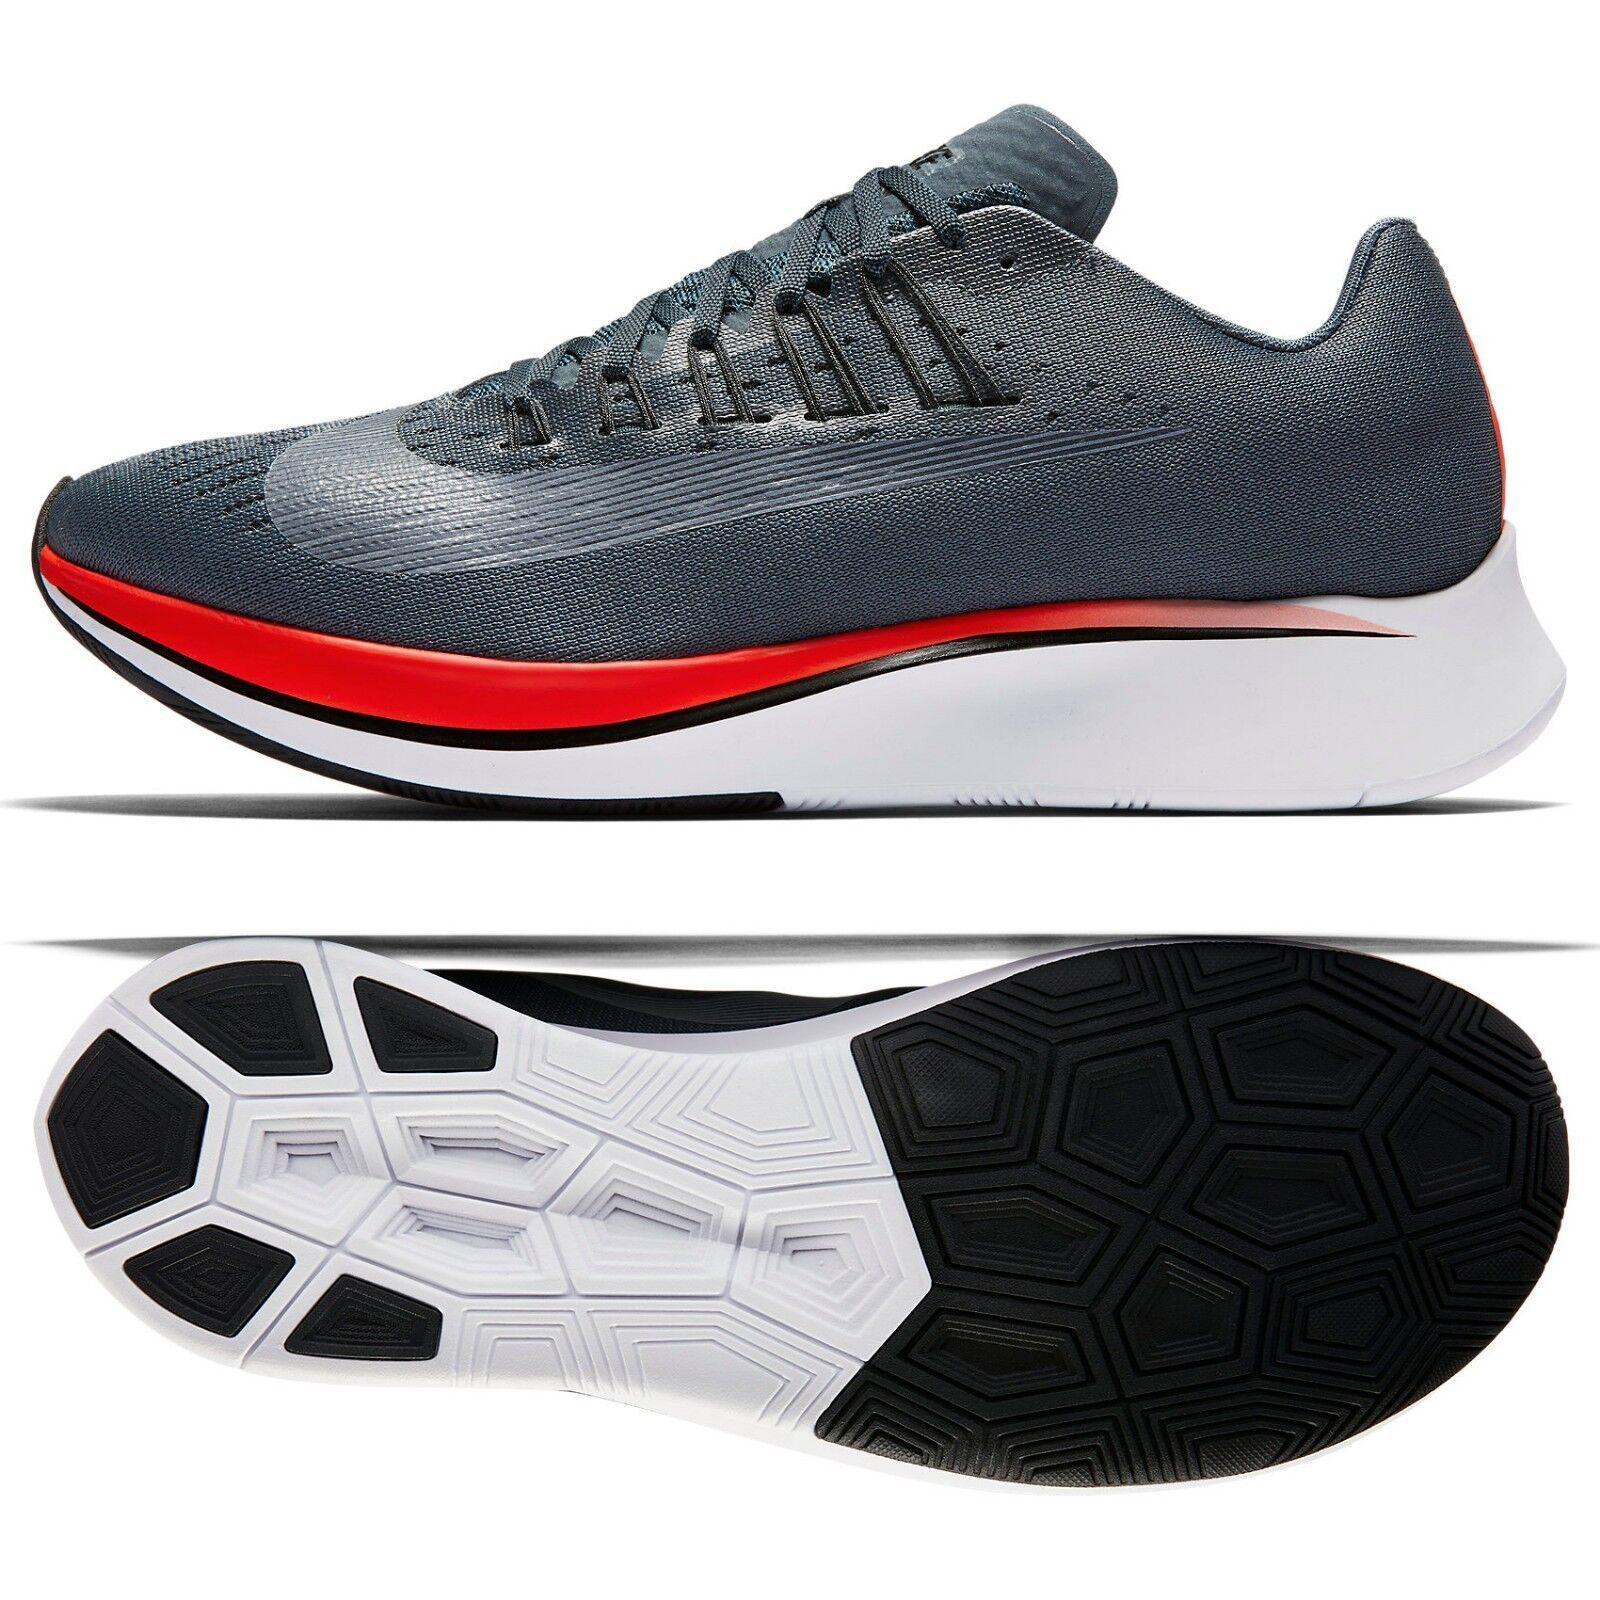 Nike Zoom Fly 880848-400 Blue Fox/Nero/Bright Crimson Uomo Running Shoes